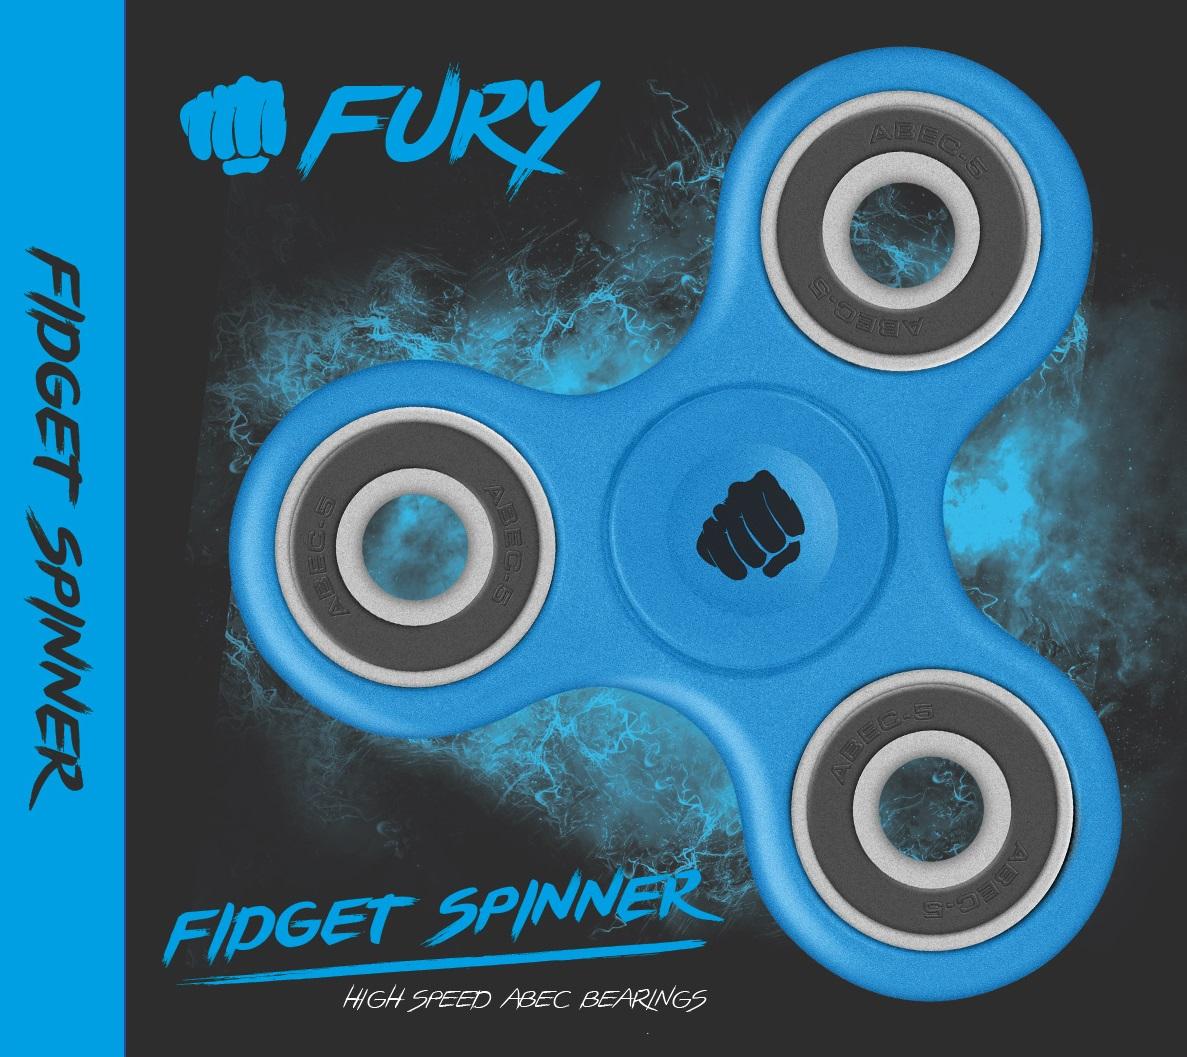 FIDGET SPINNER FURY NIEBIESKI